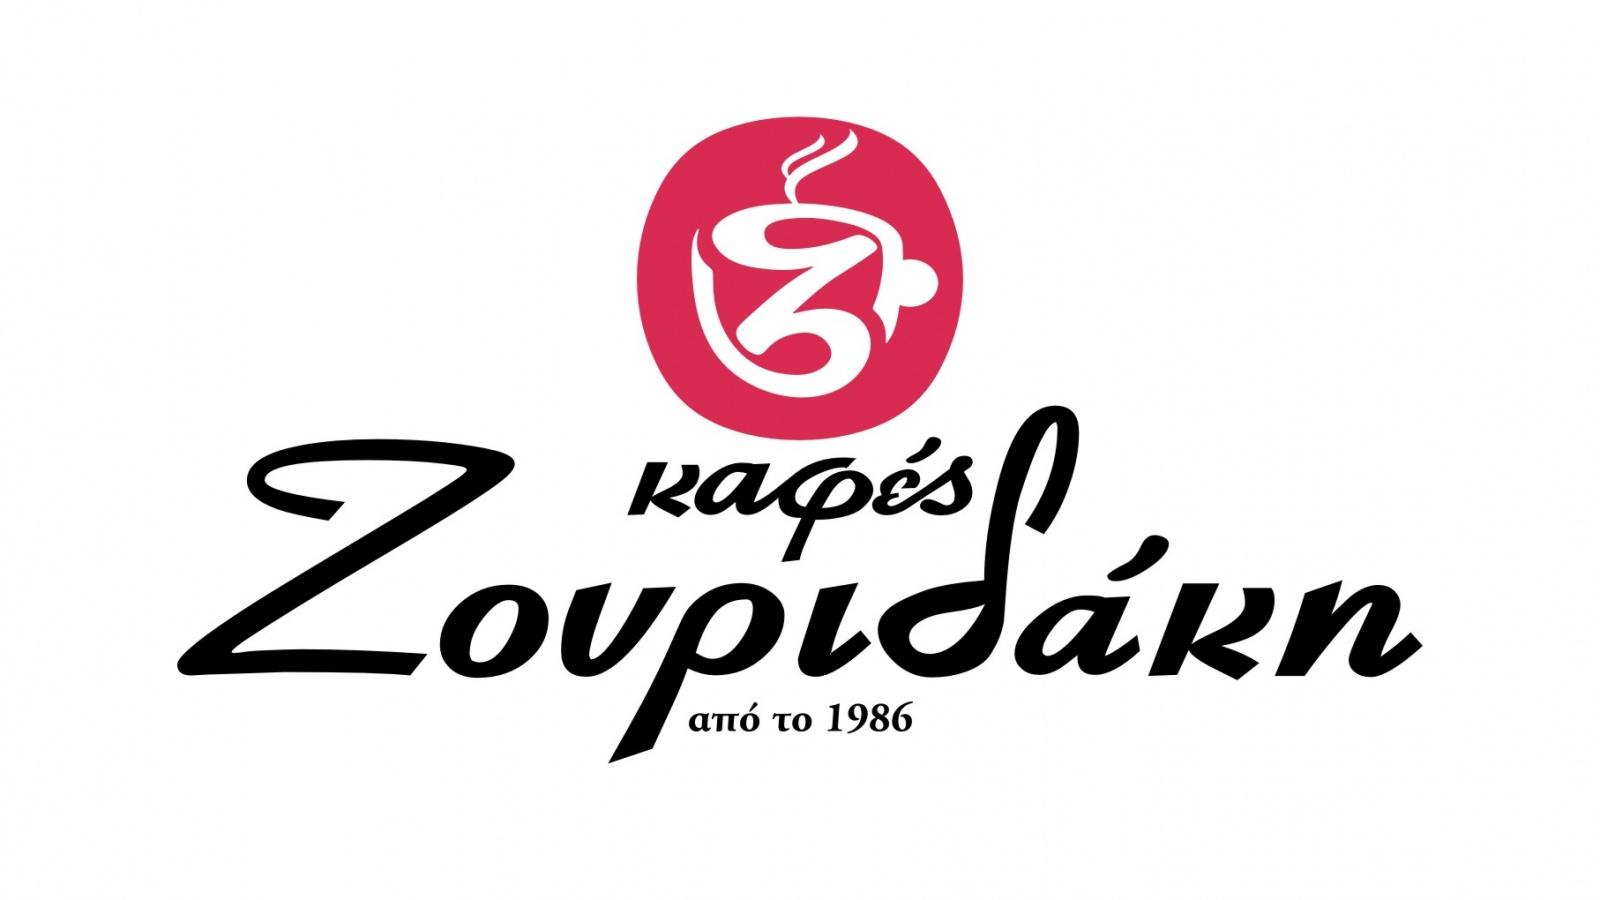 logo_zouridakh